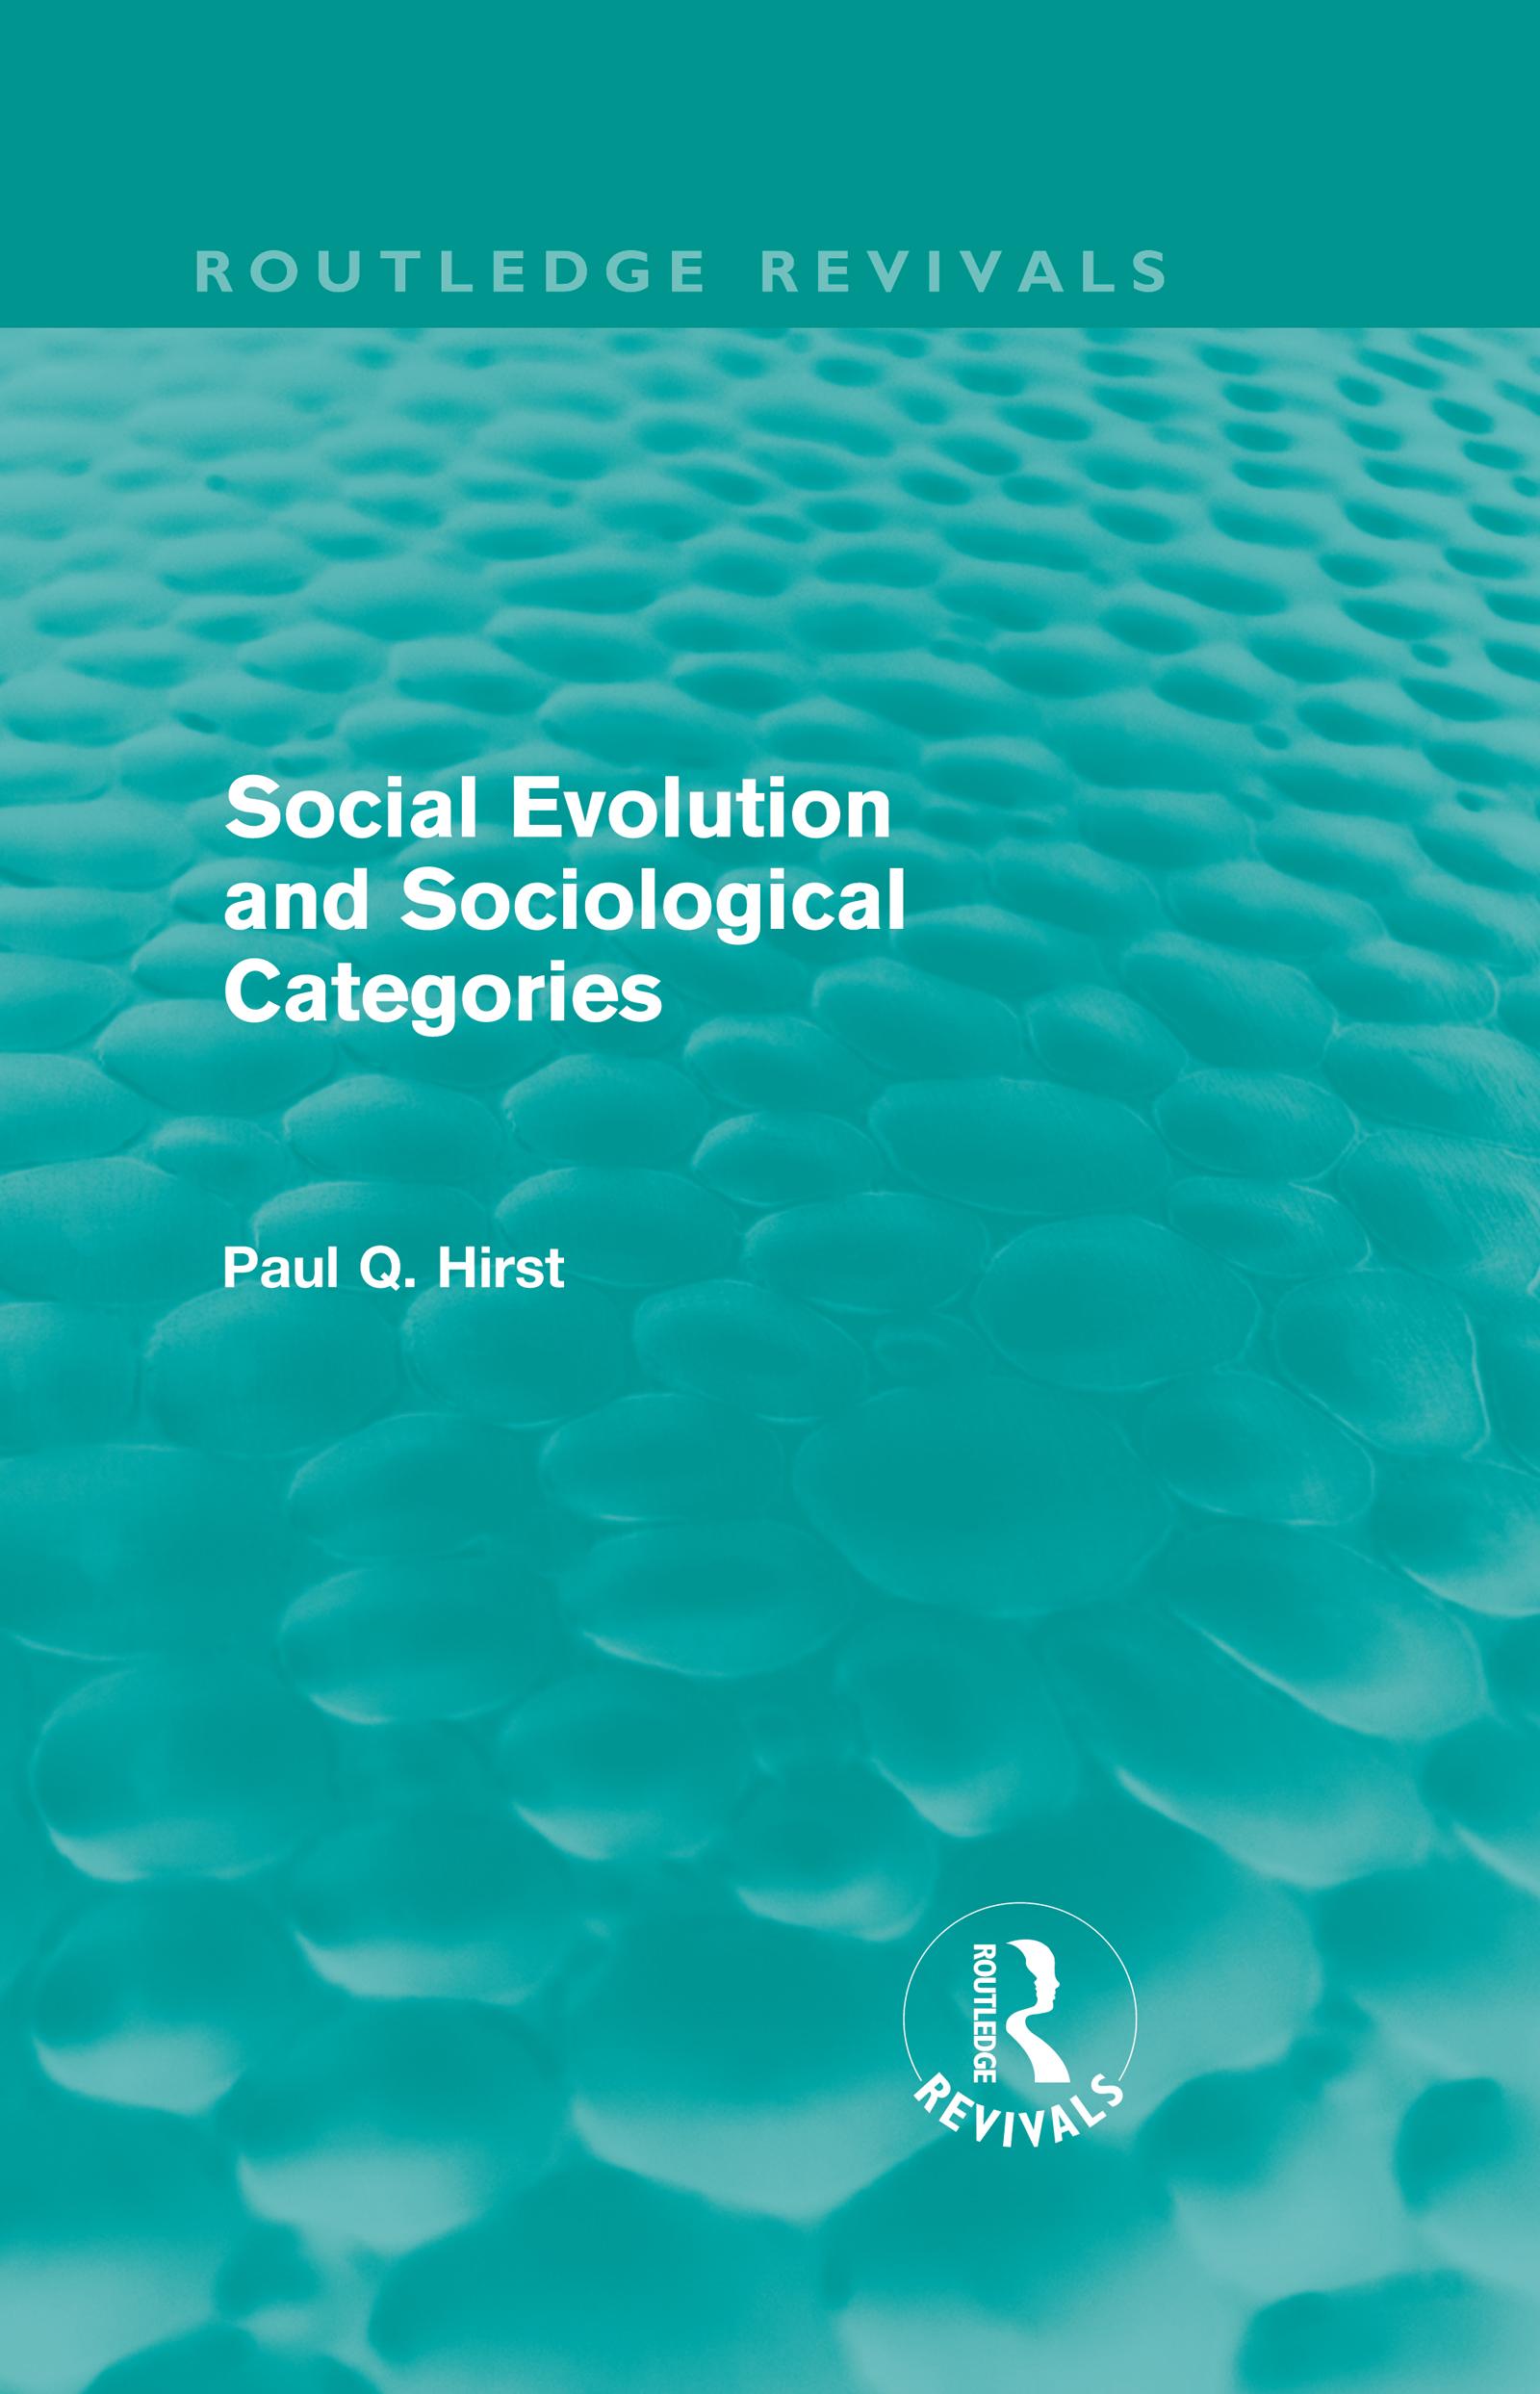 Social Evolution and Sociological Categories (Routledge Revivals)